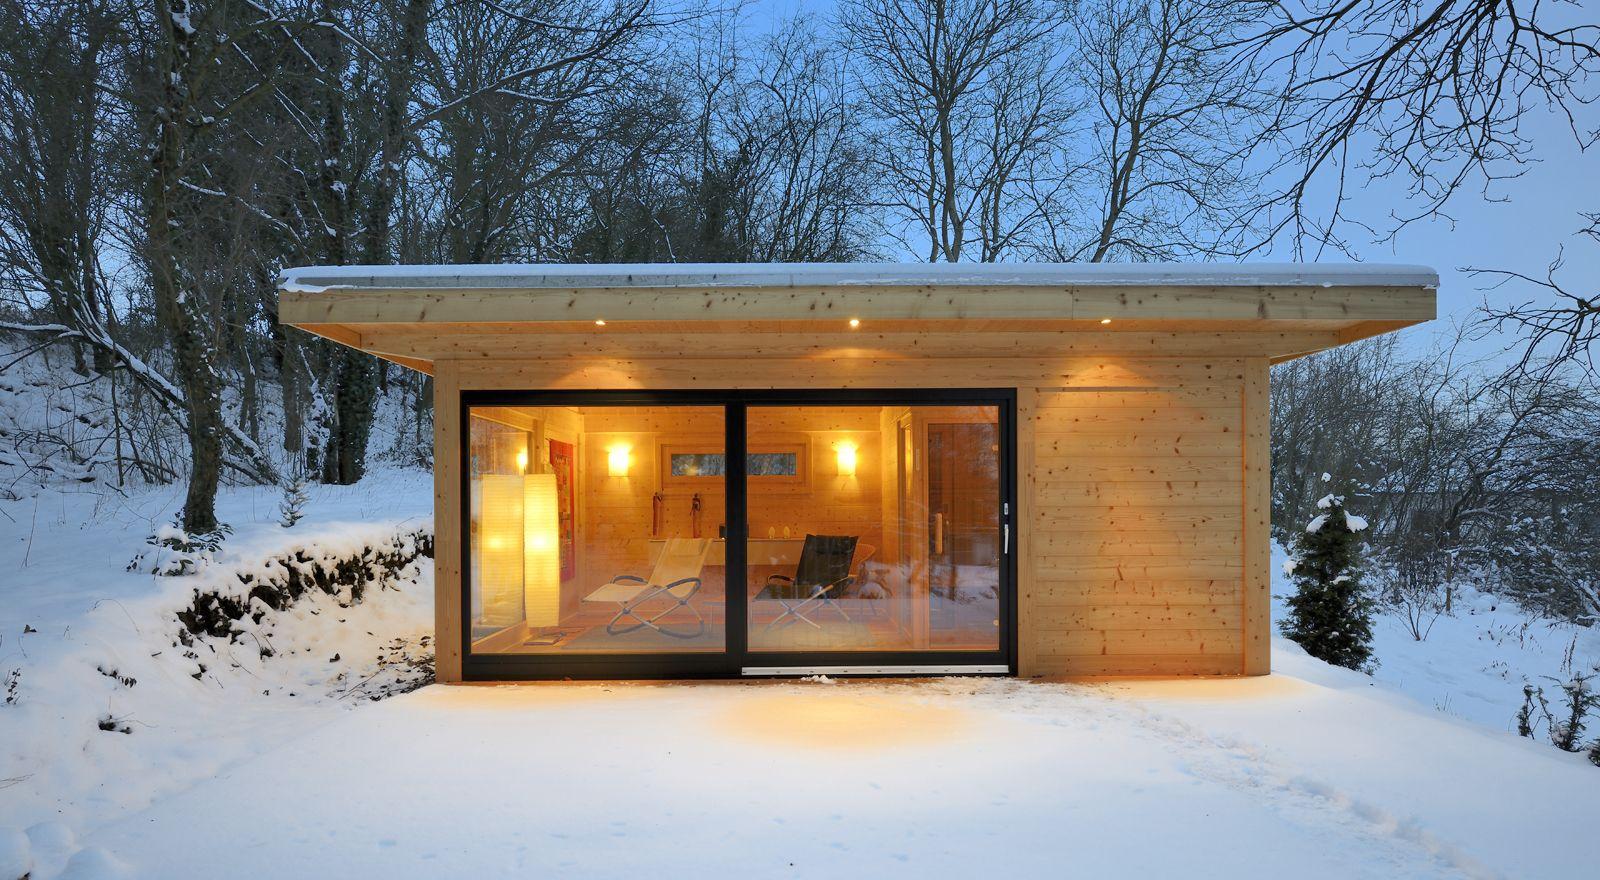 Hummel Blockhaus Gartenhäuser, Pavillons, Whirlpoolhäuser